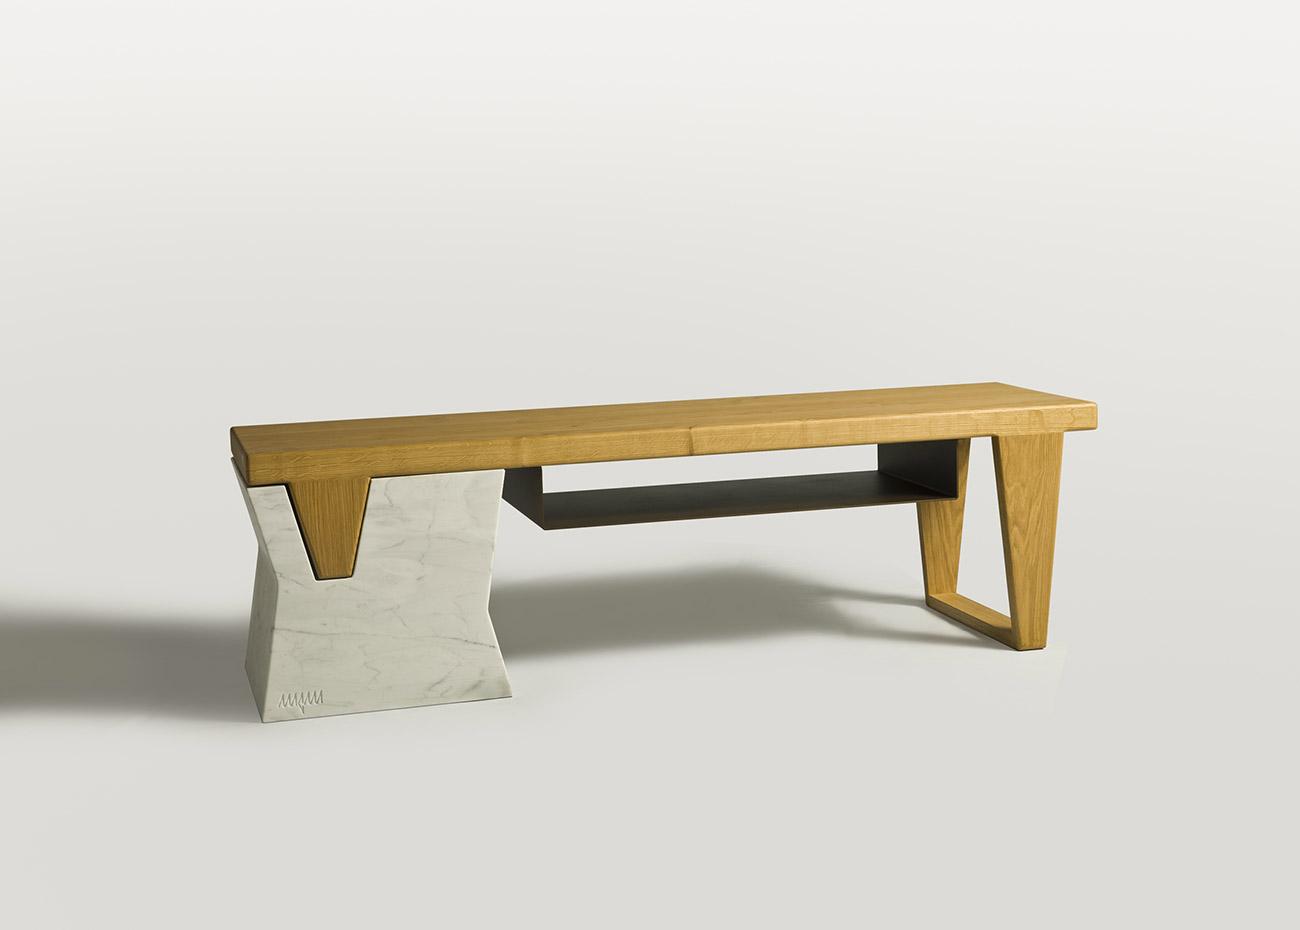 panca-in-marmo-e-legno-design-collection-plaza